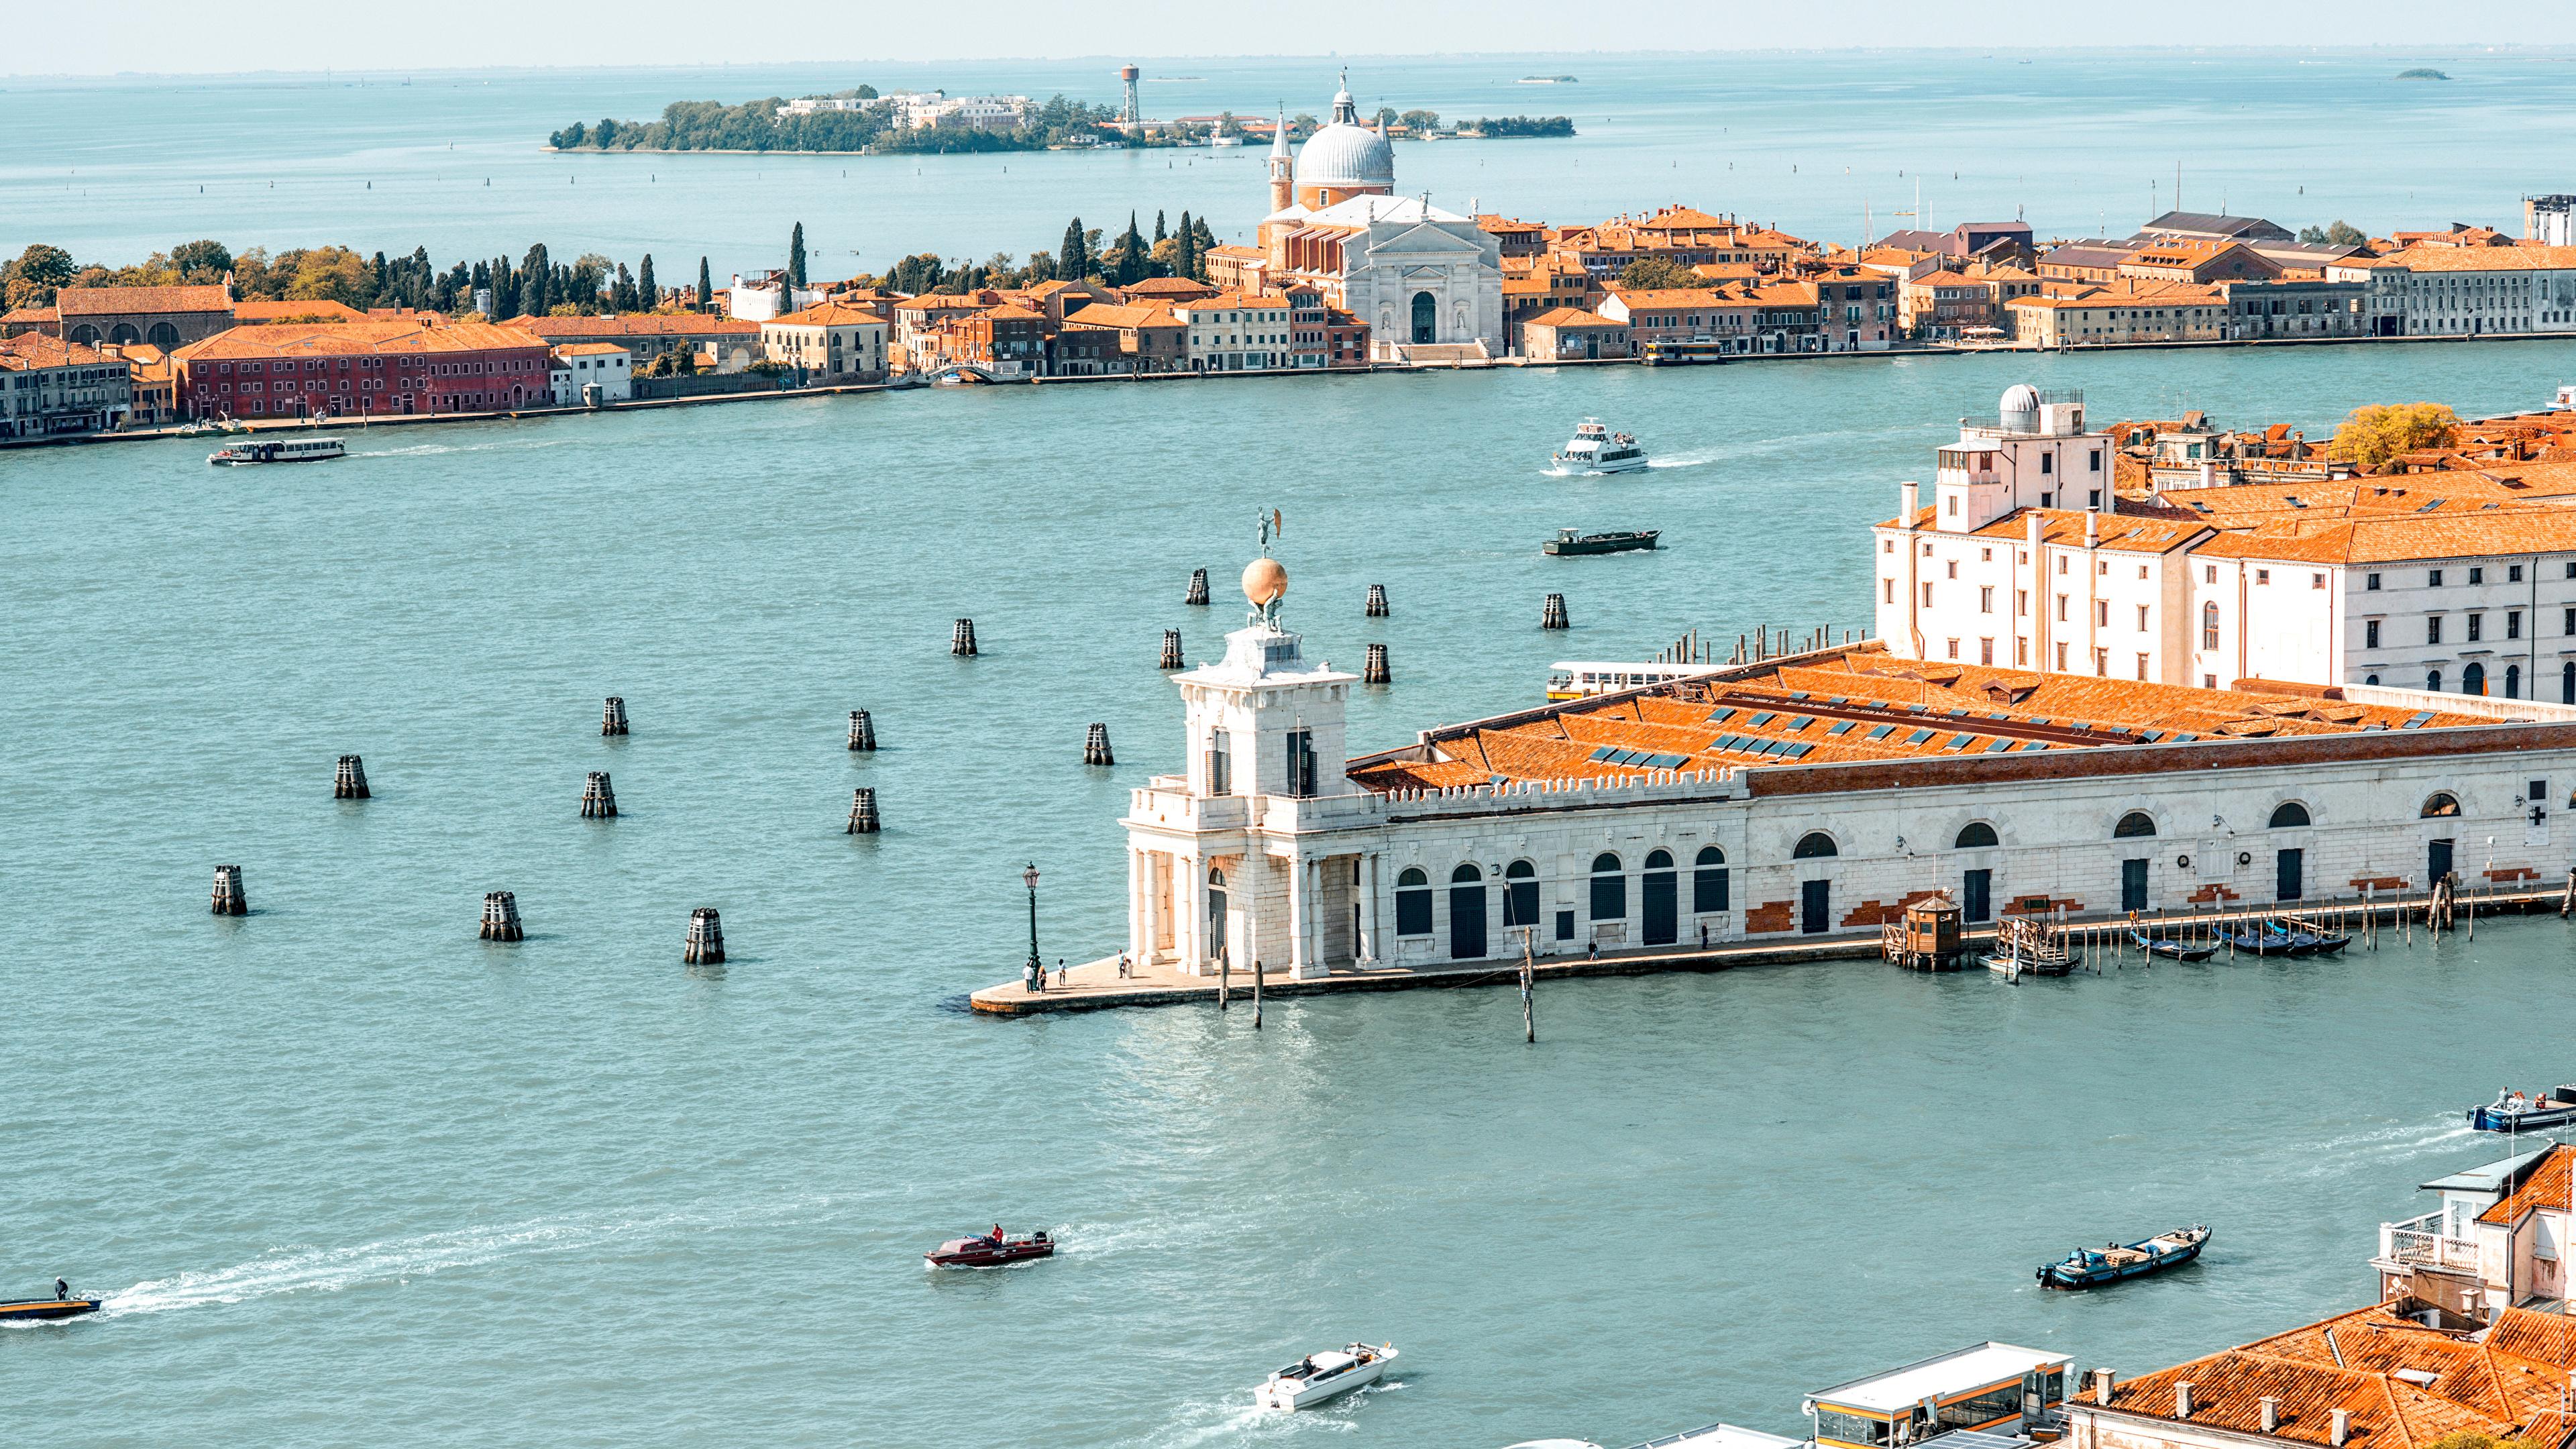 Wallpapers Venice Italy Sea Bay Marinas Motorboat Cities 3840x2160